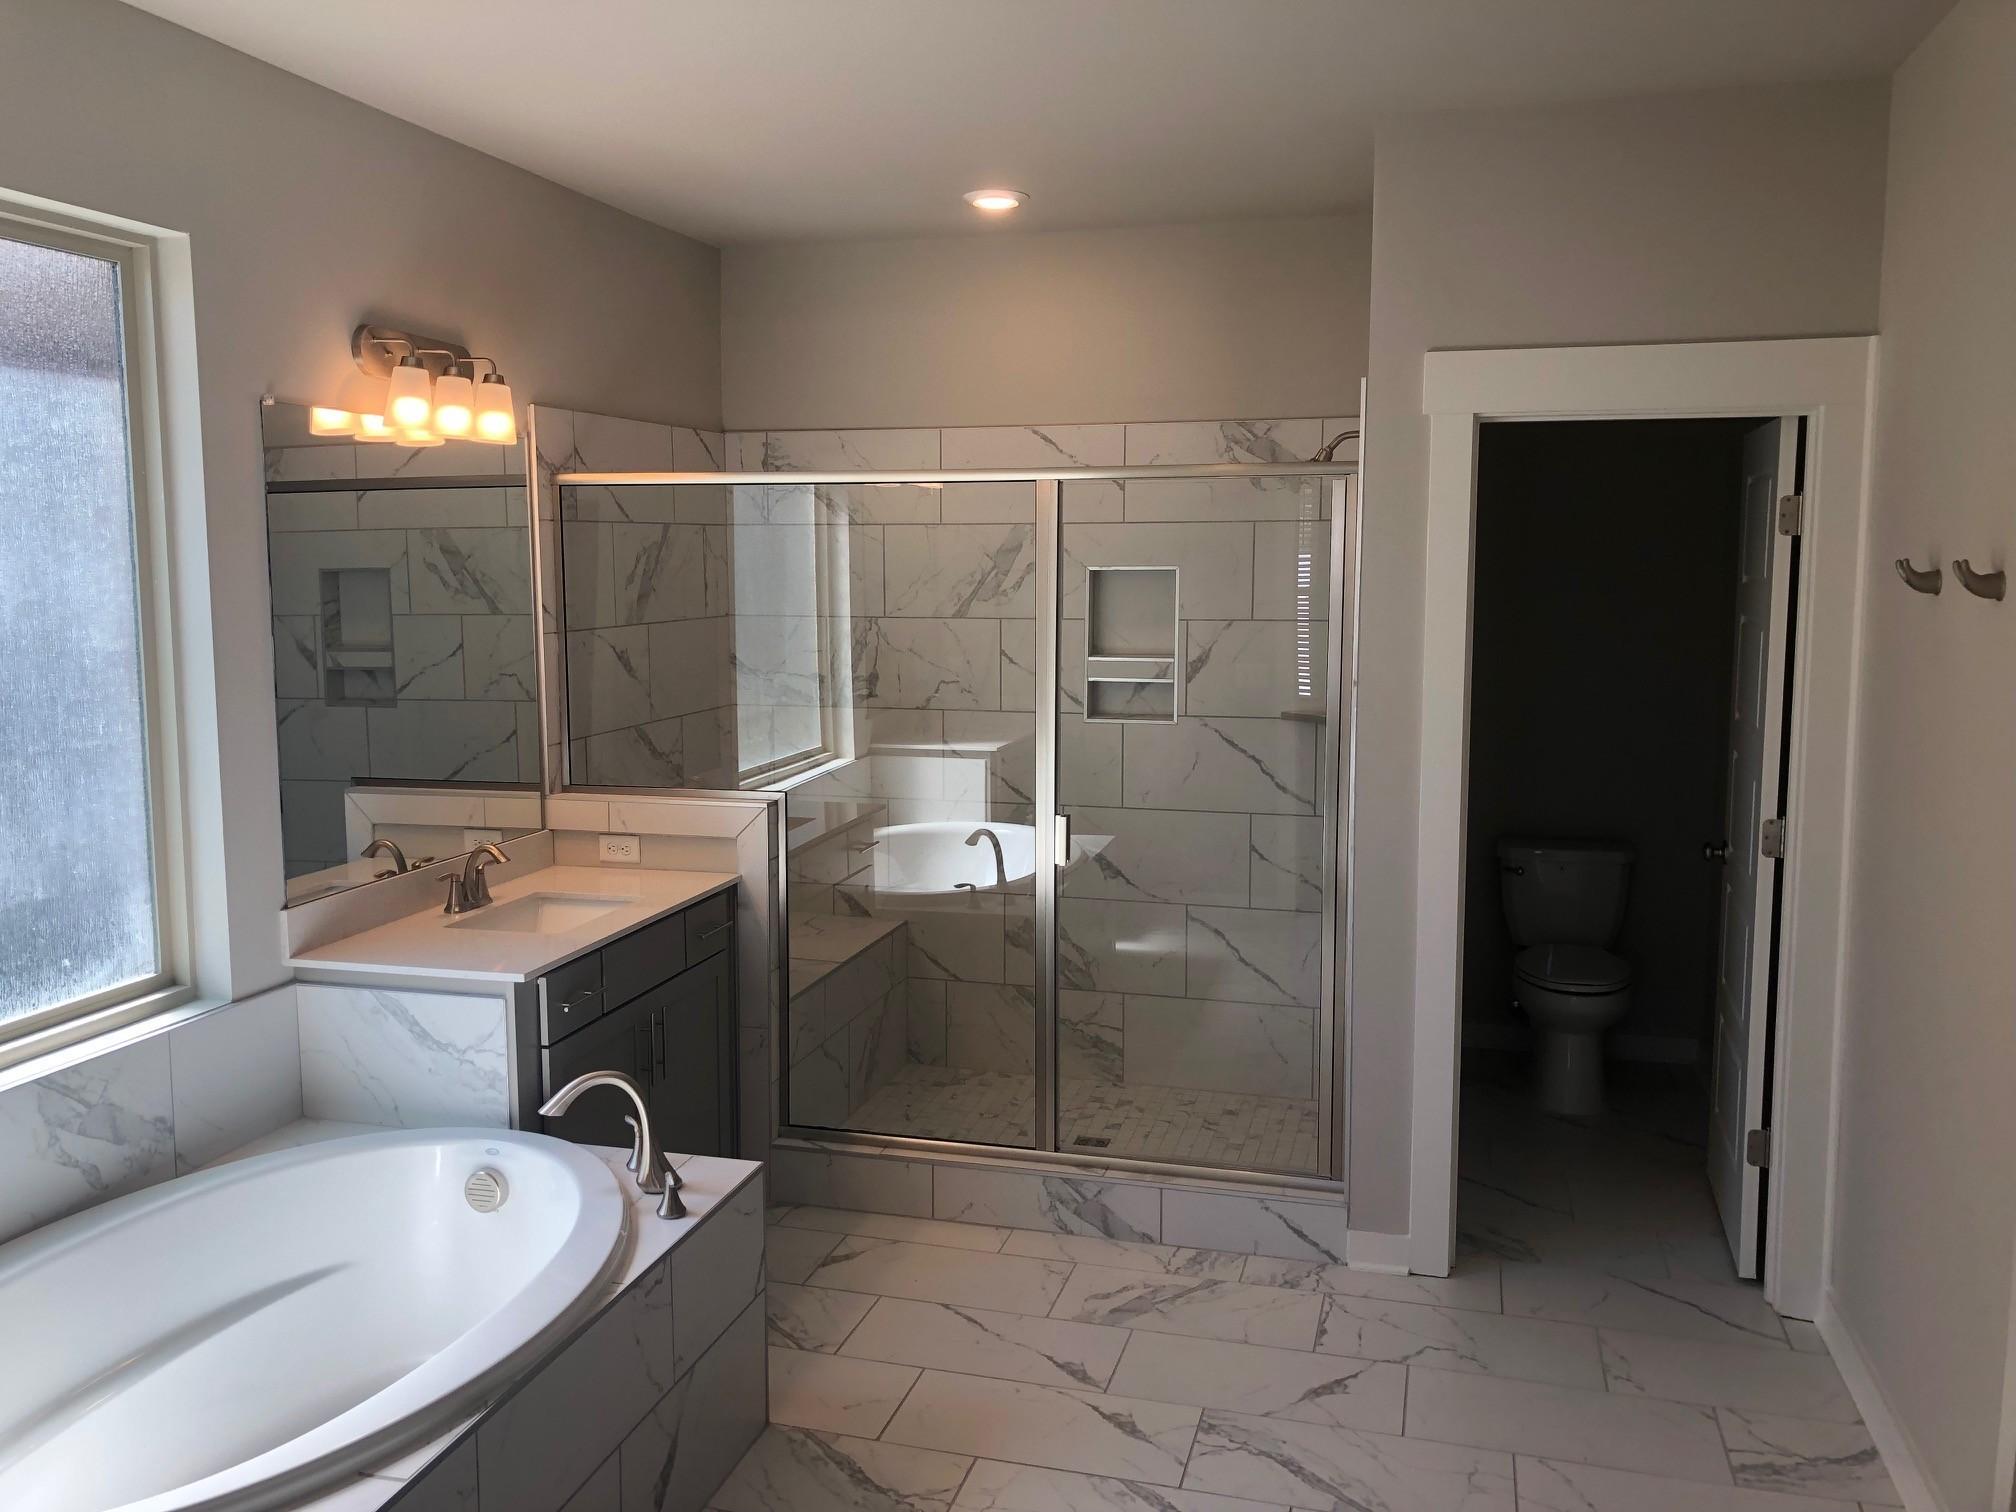 4727 Lapis Lane Lot 221A, Murfreesboro, TN 37128 - Murfreesboro, TN real estate listing